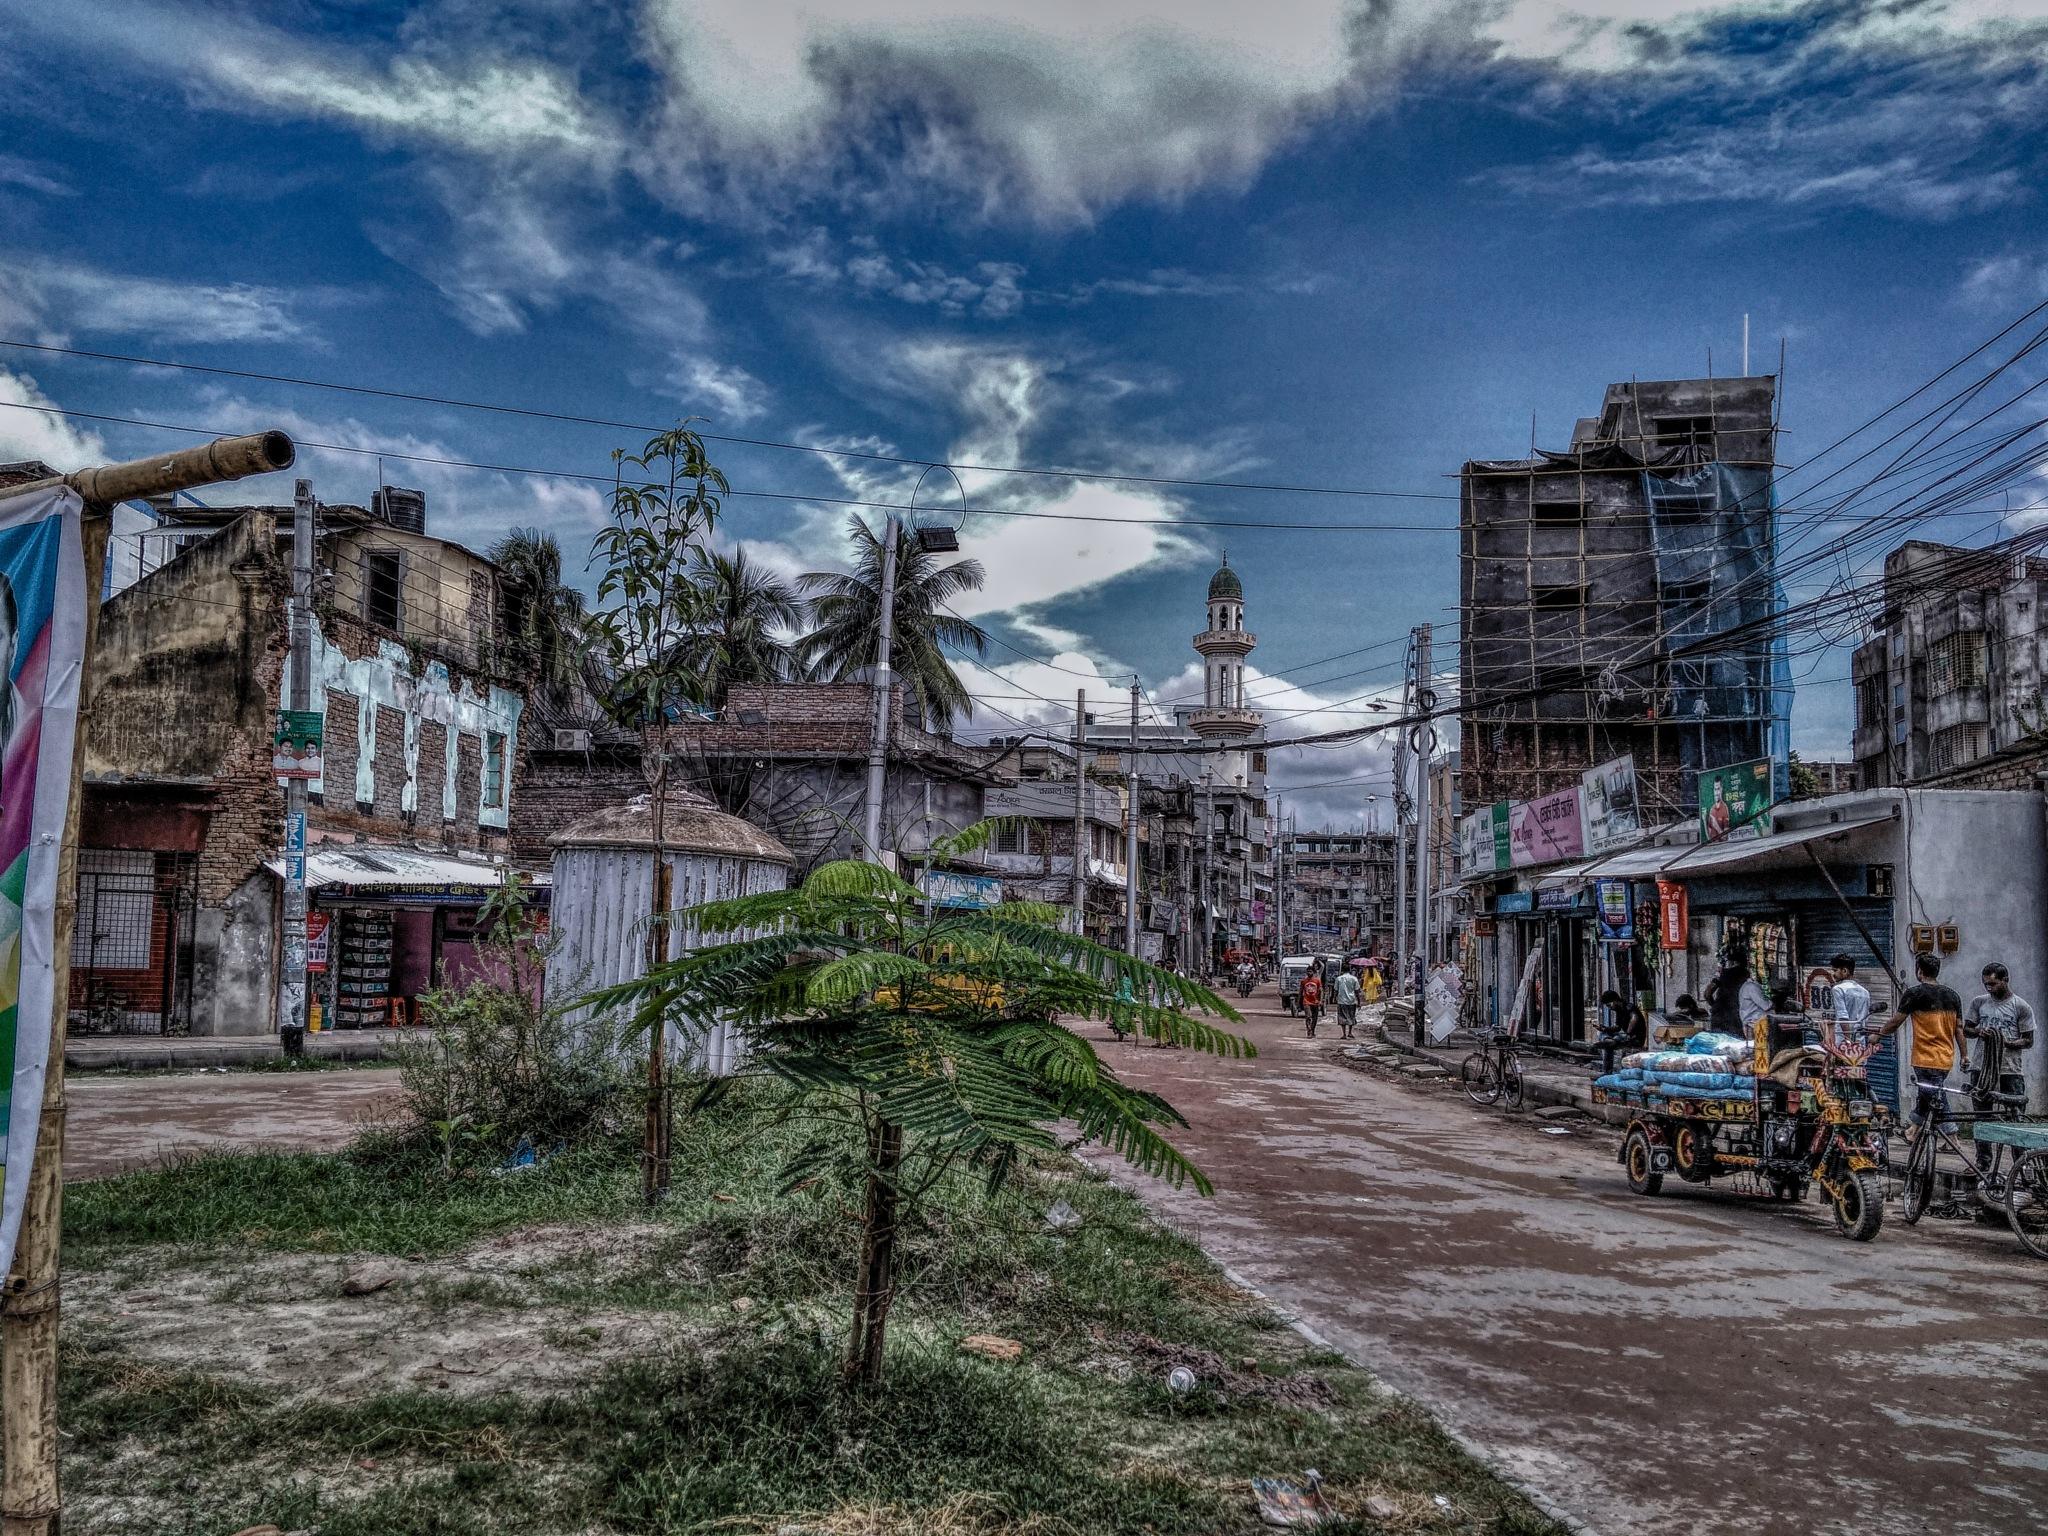 A New Day by Ashik Iqbal